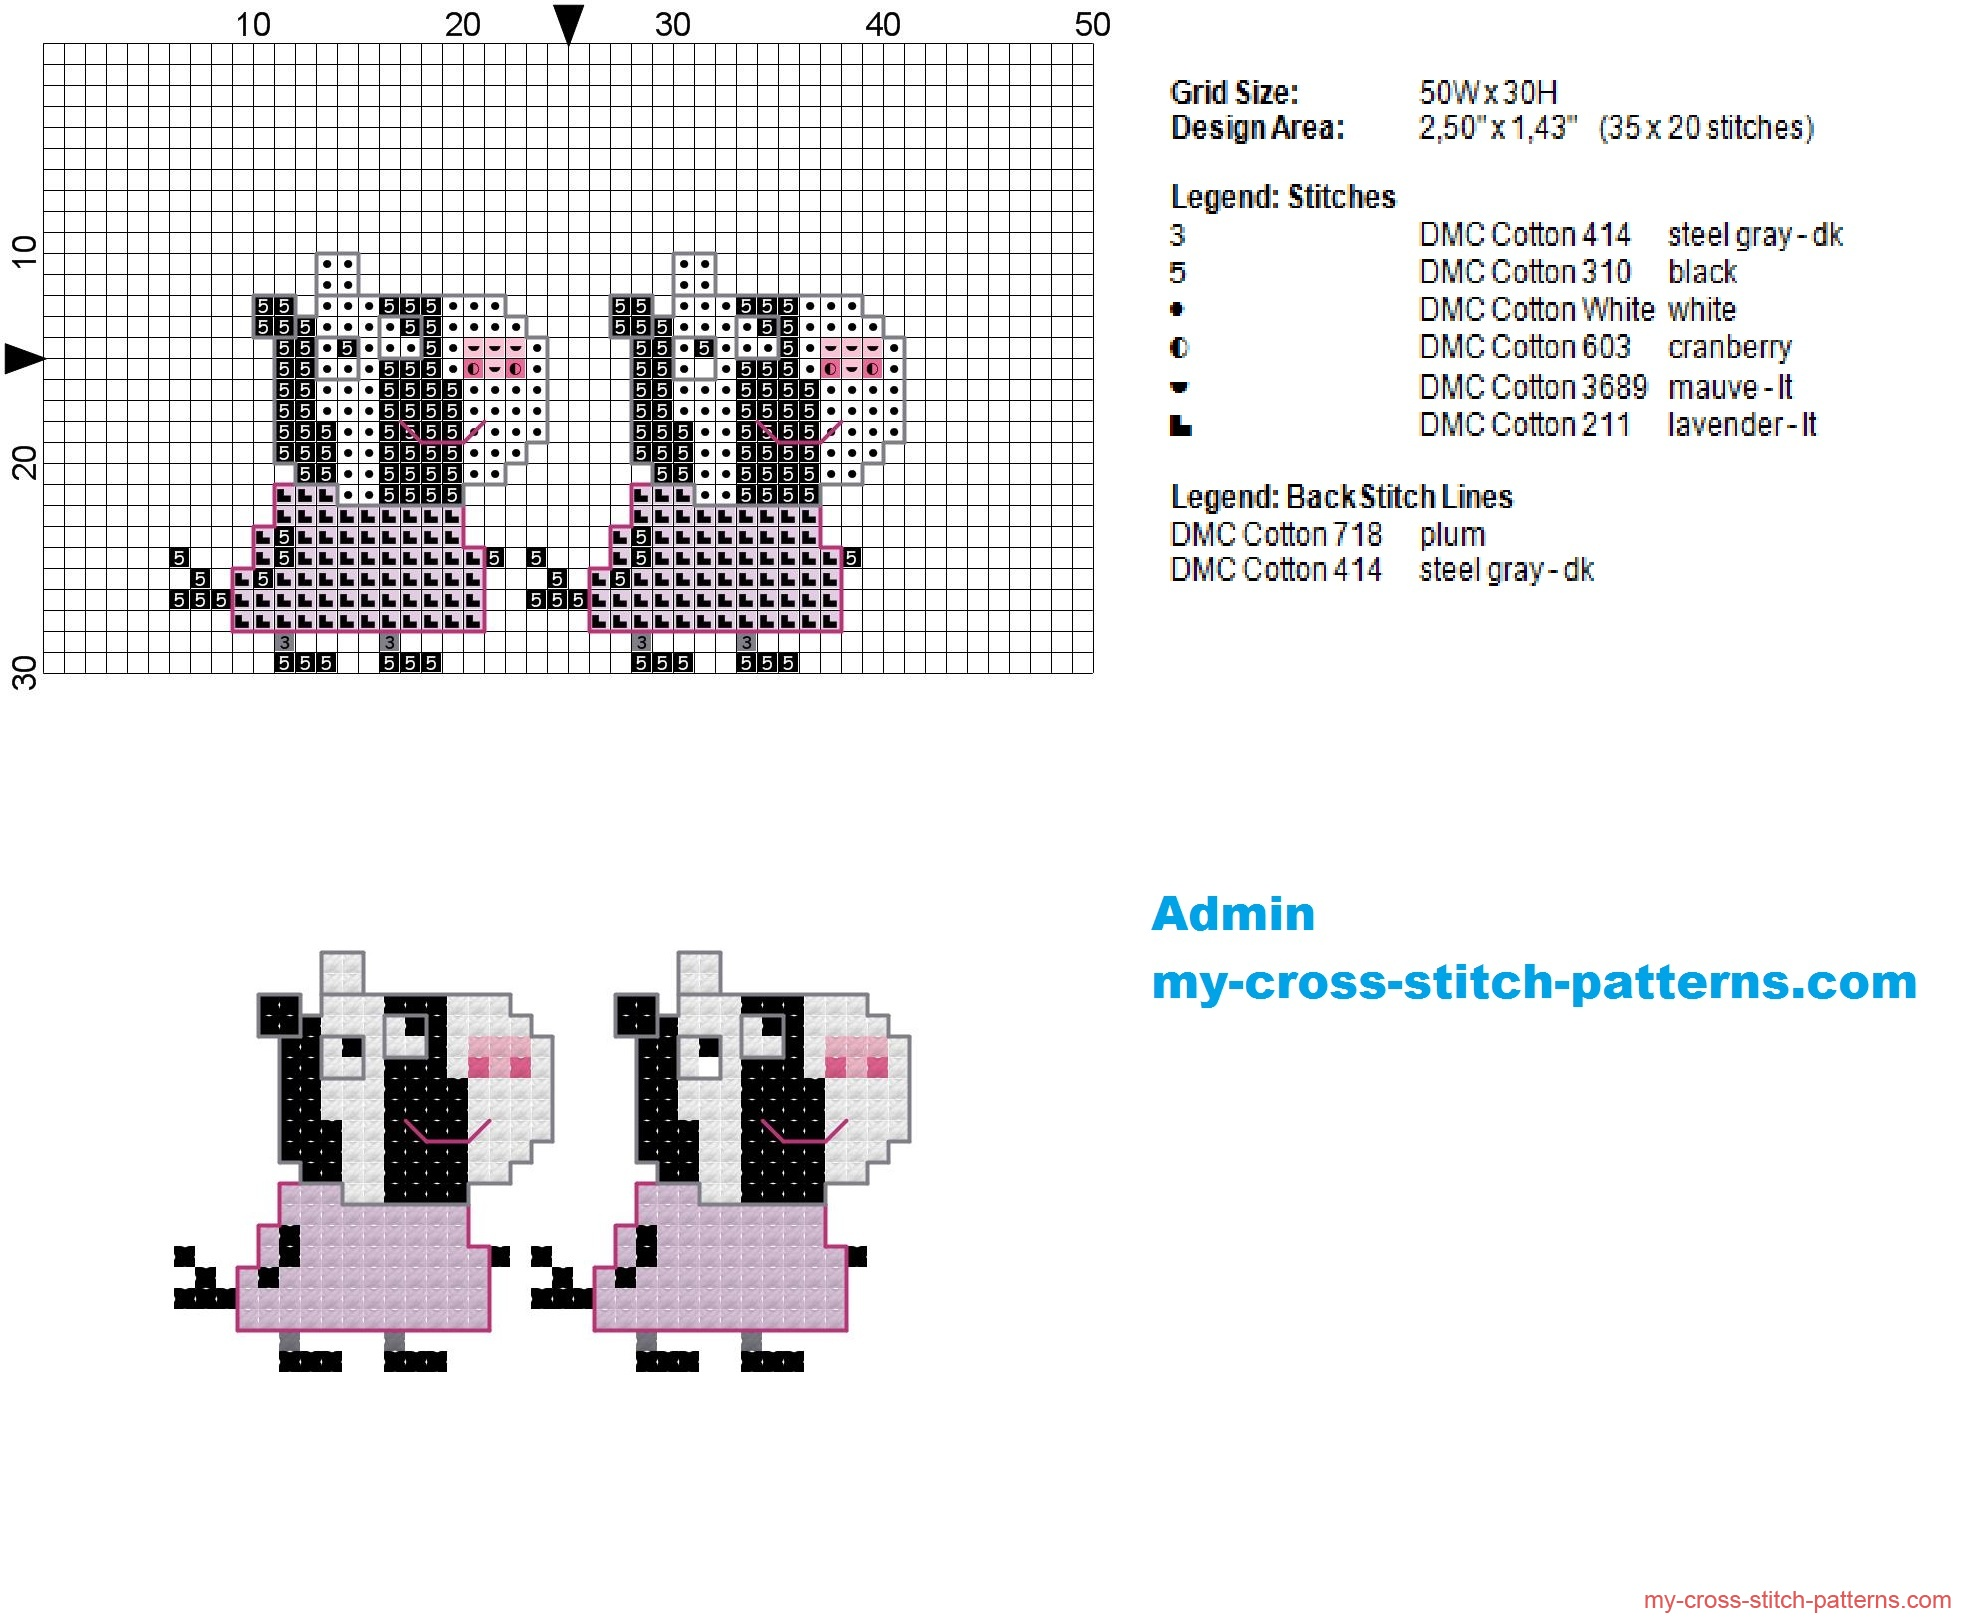 zuzu_and_zaza_zebra_small_cross_stitch_pattern_of_peppa_pig_35x20